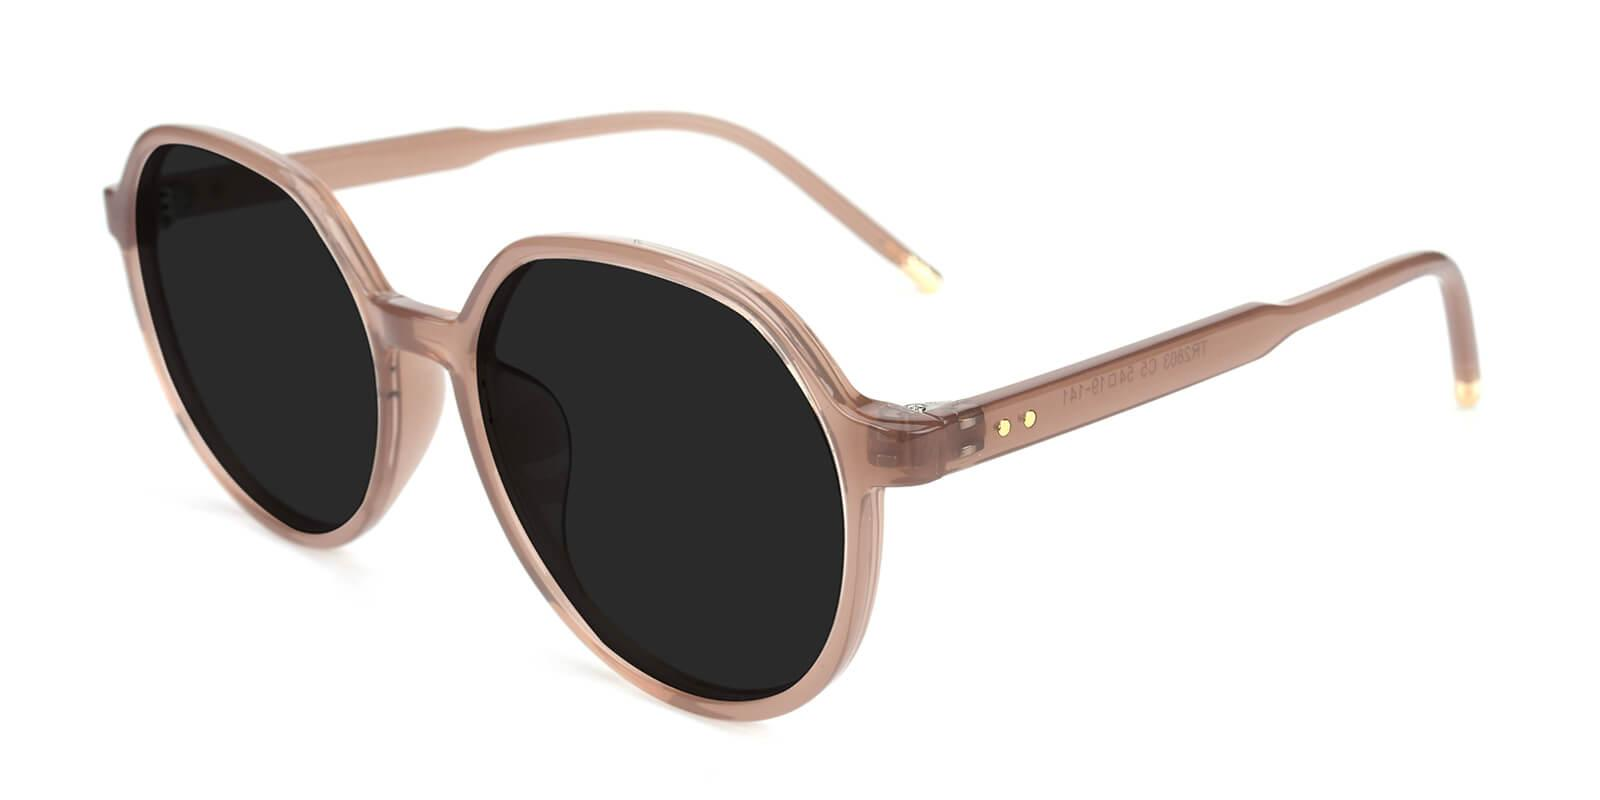 Songi-Pink-Round-TR-Sunglasses-additional1